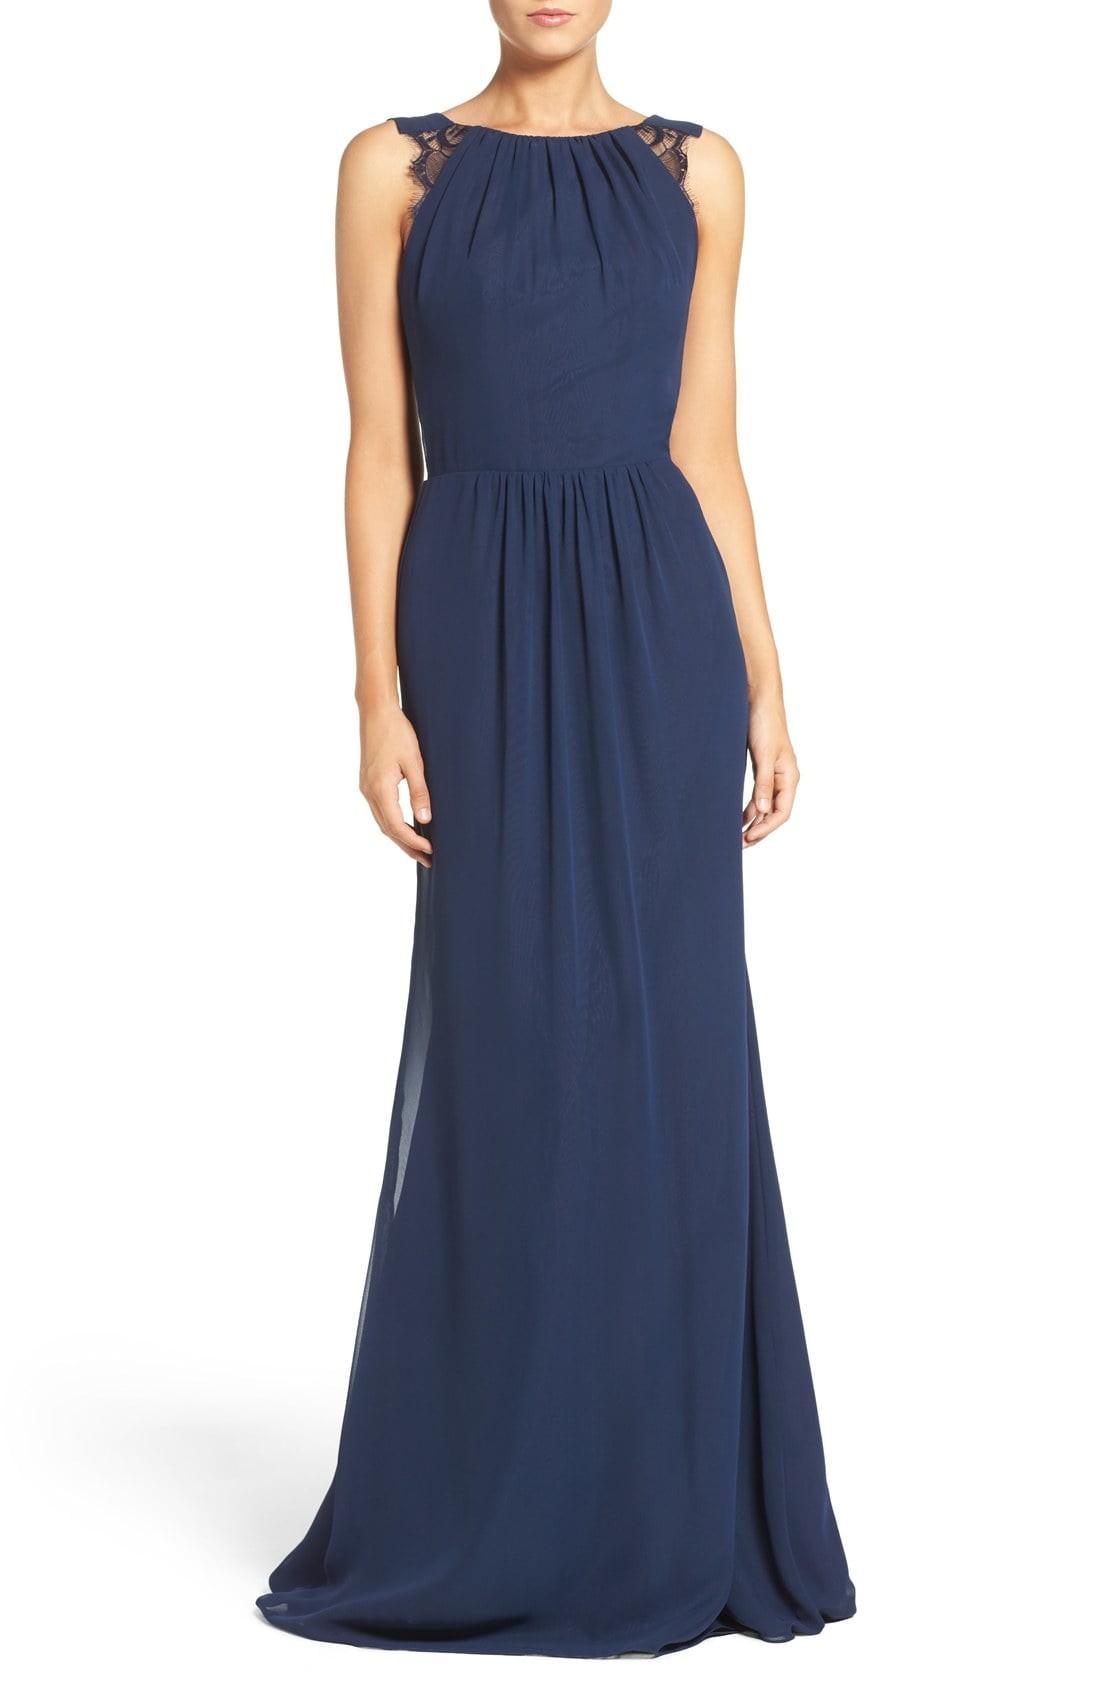 Dark blue bridesmaid dresses navy blue bridesmaid dresses nordstrom ombrellifo Image collections